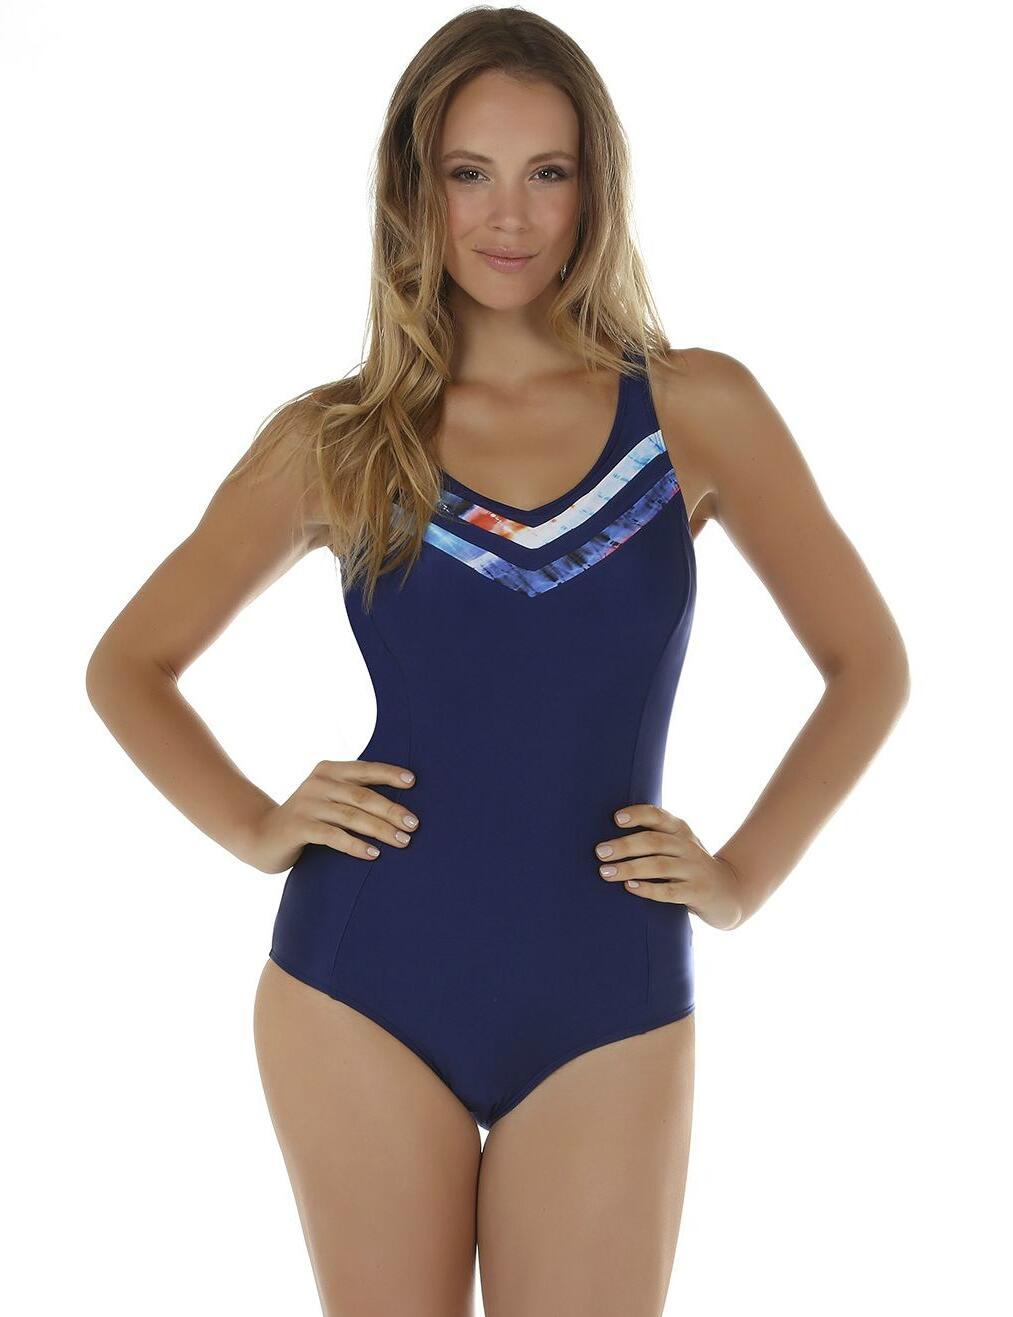 08-2100 Seaspray Crete Panelled Swimsuit - 08-2100 Blue/Orange